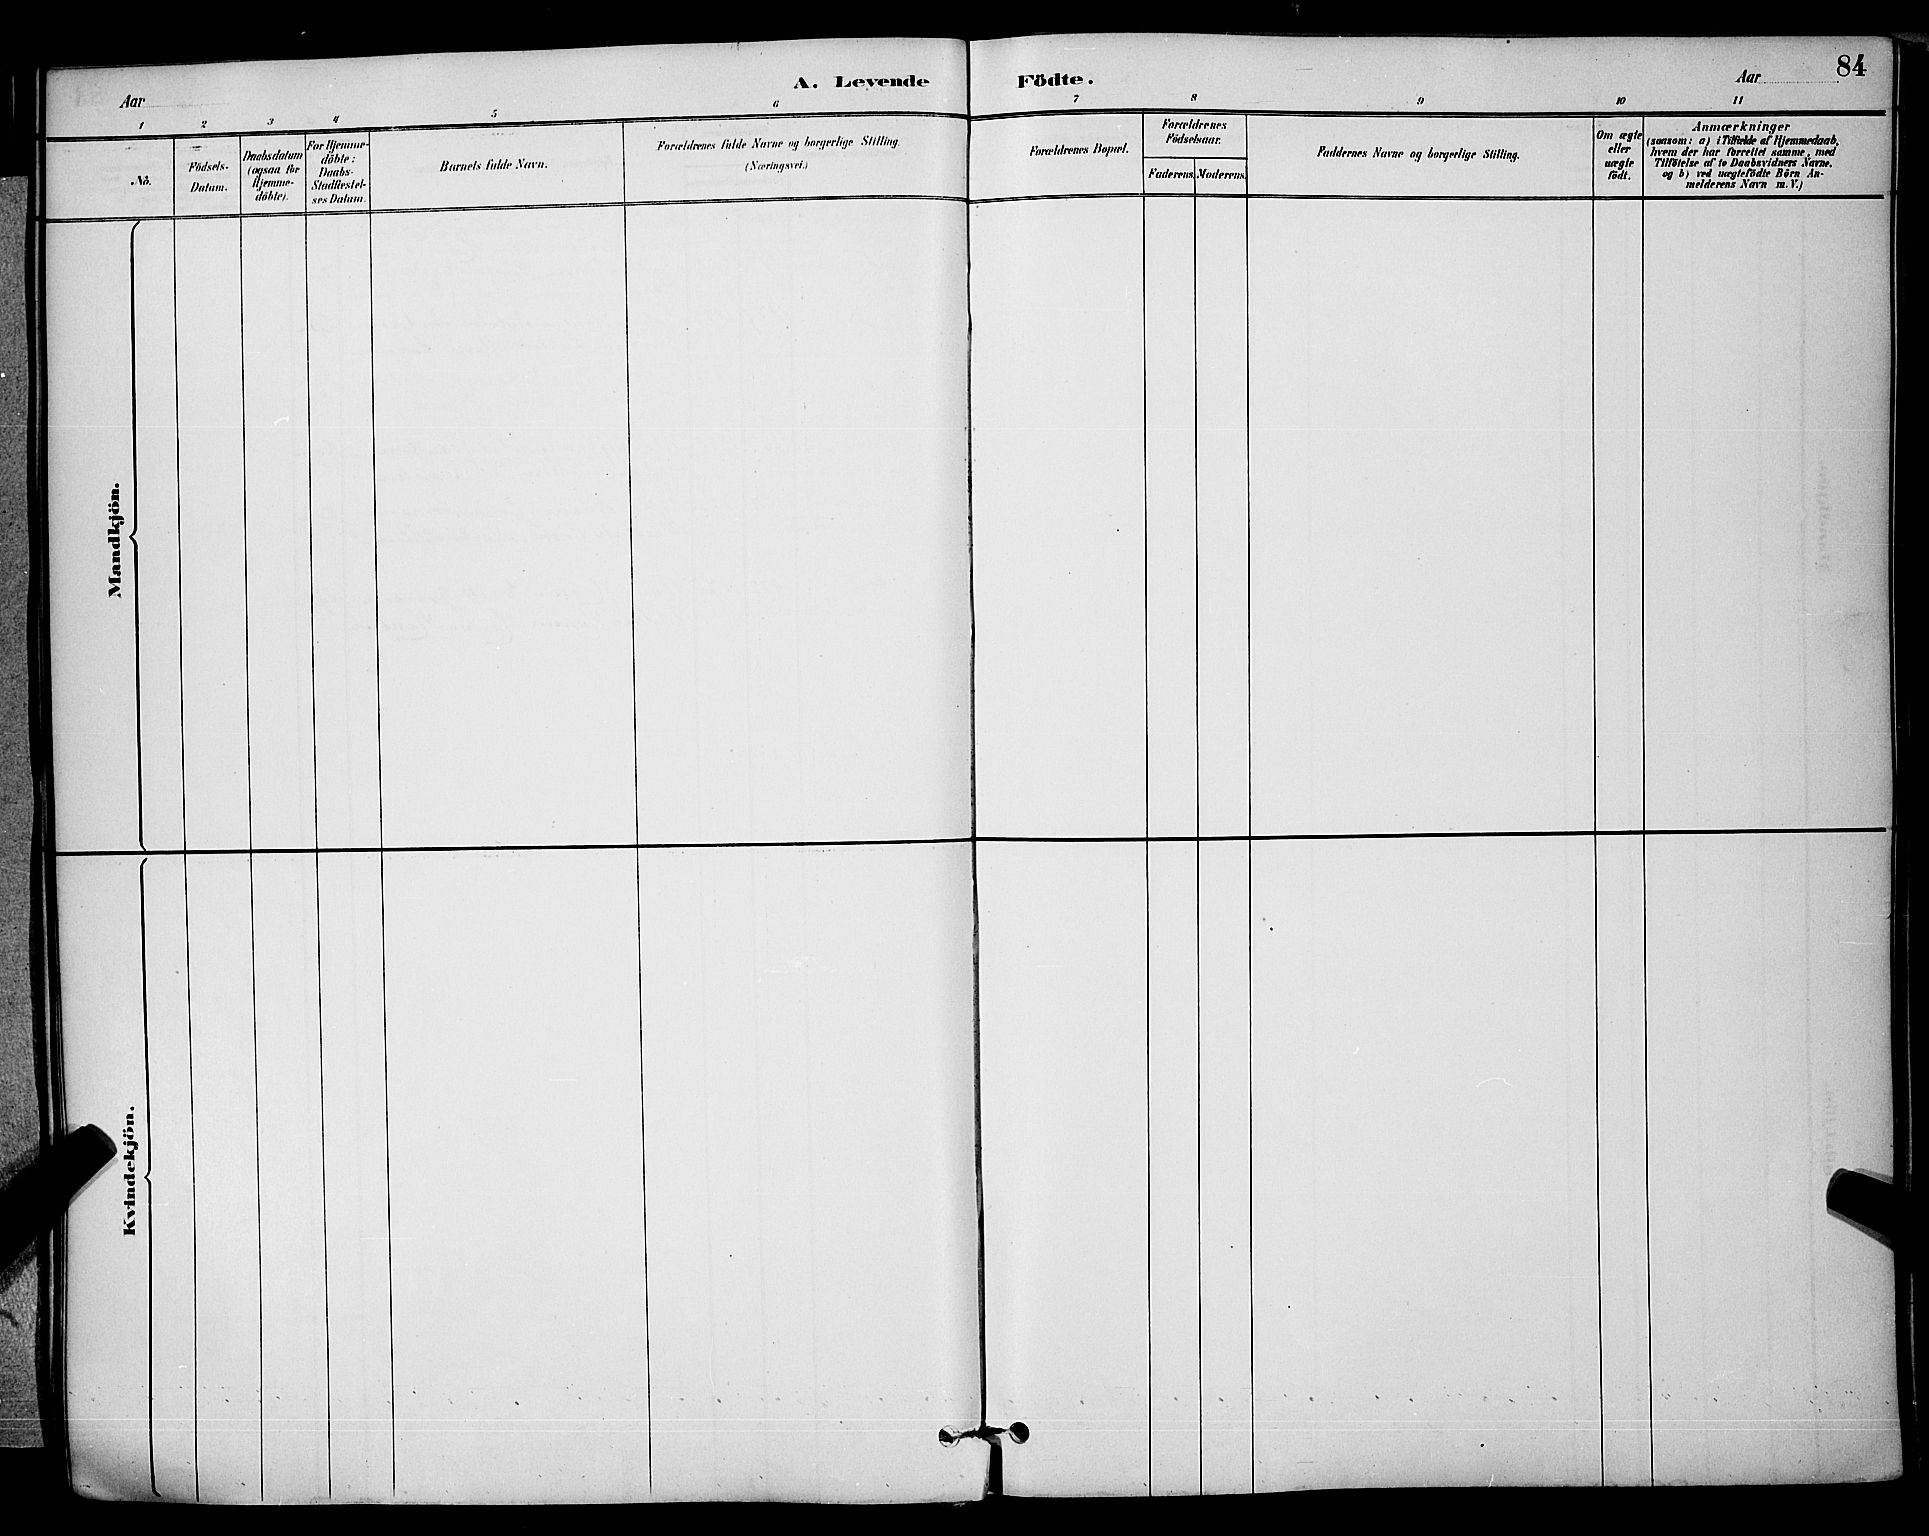 SAKO, Brevik kirkebøker, G/Ga/L0004: Klokkerbok nr. 4, 1882-1900, s. 84